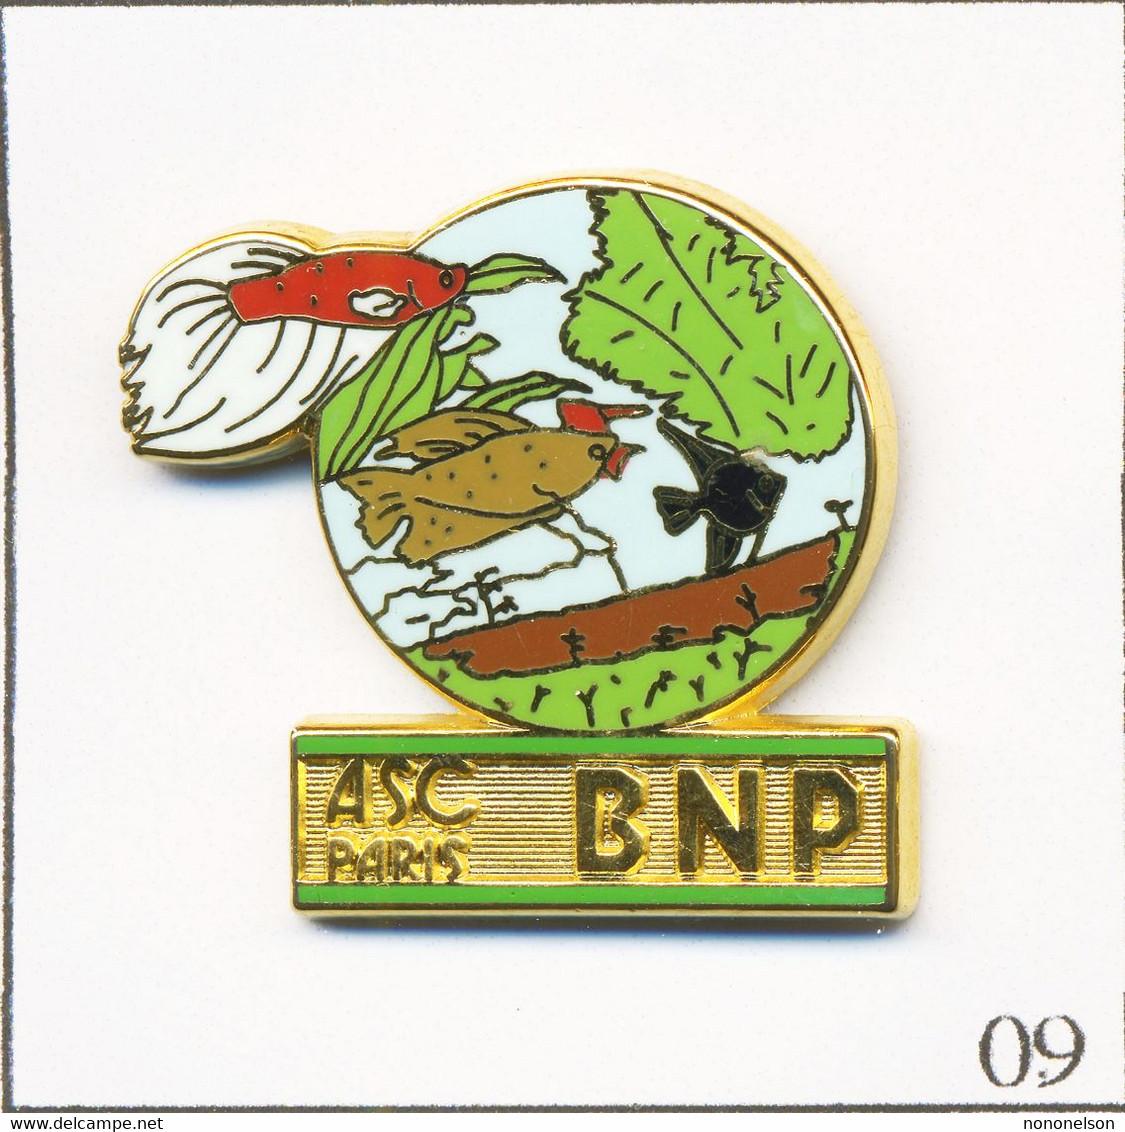 Pin's Banque / Assurance - BNP / ASC Paris - Aquariophilie. Estampillé Ballard. Zamac. T738-09 - Banche